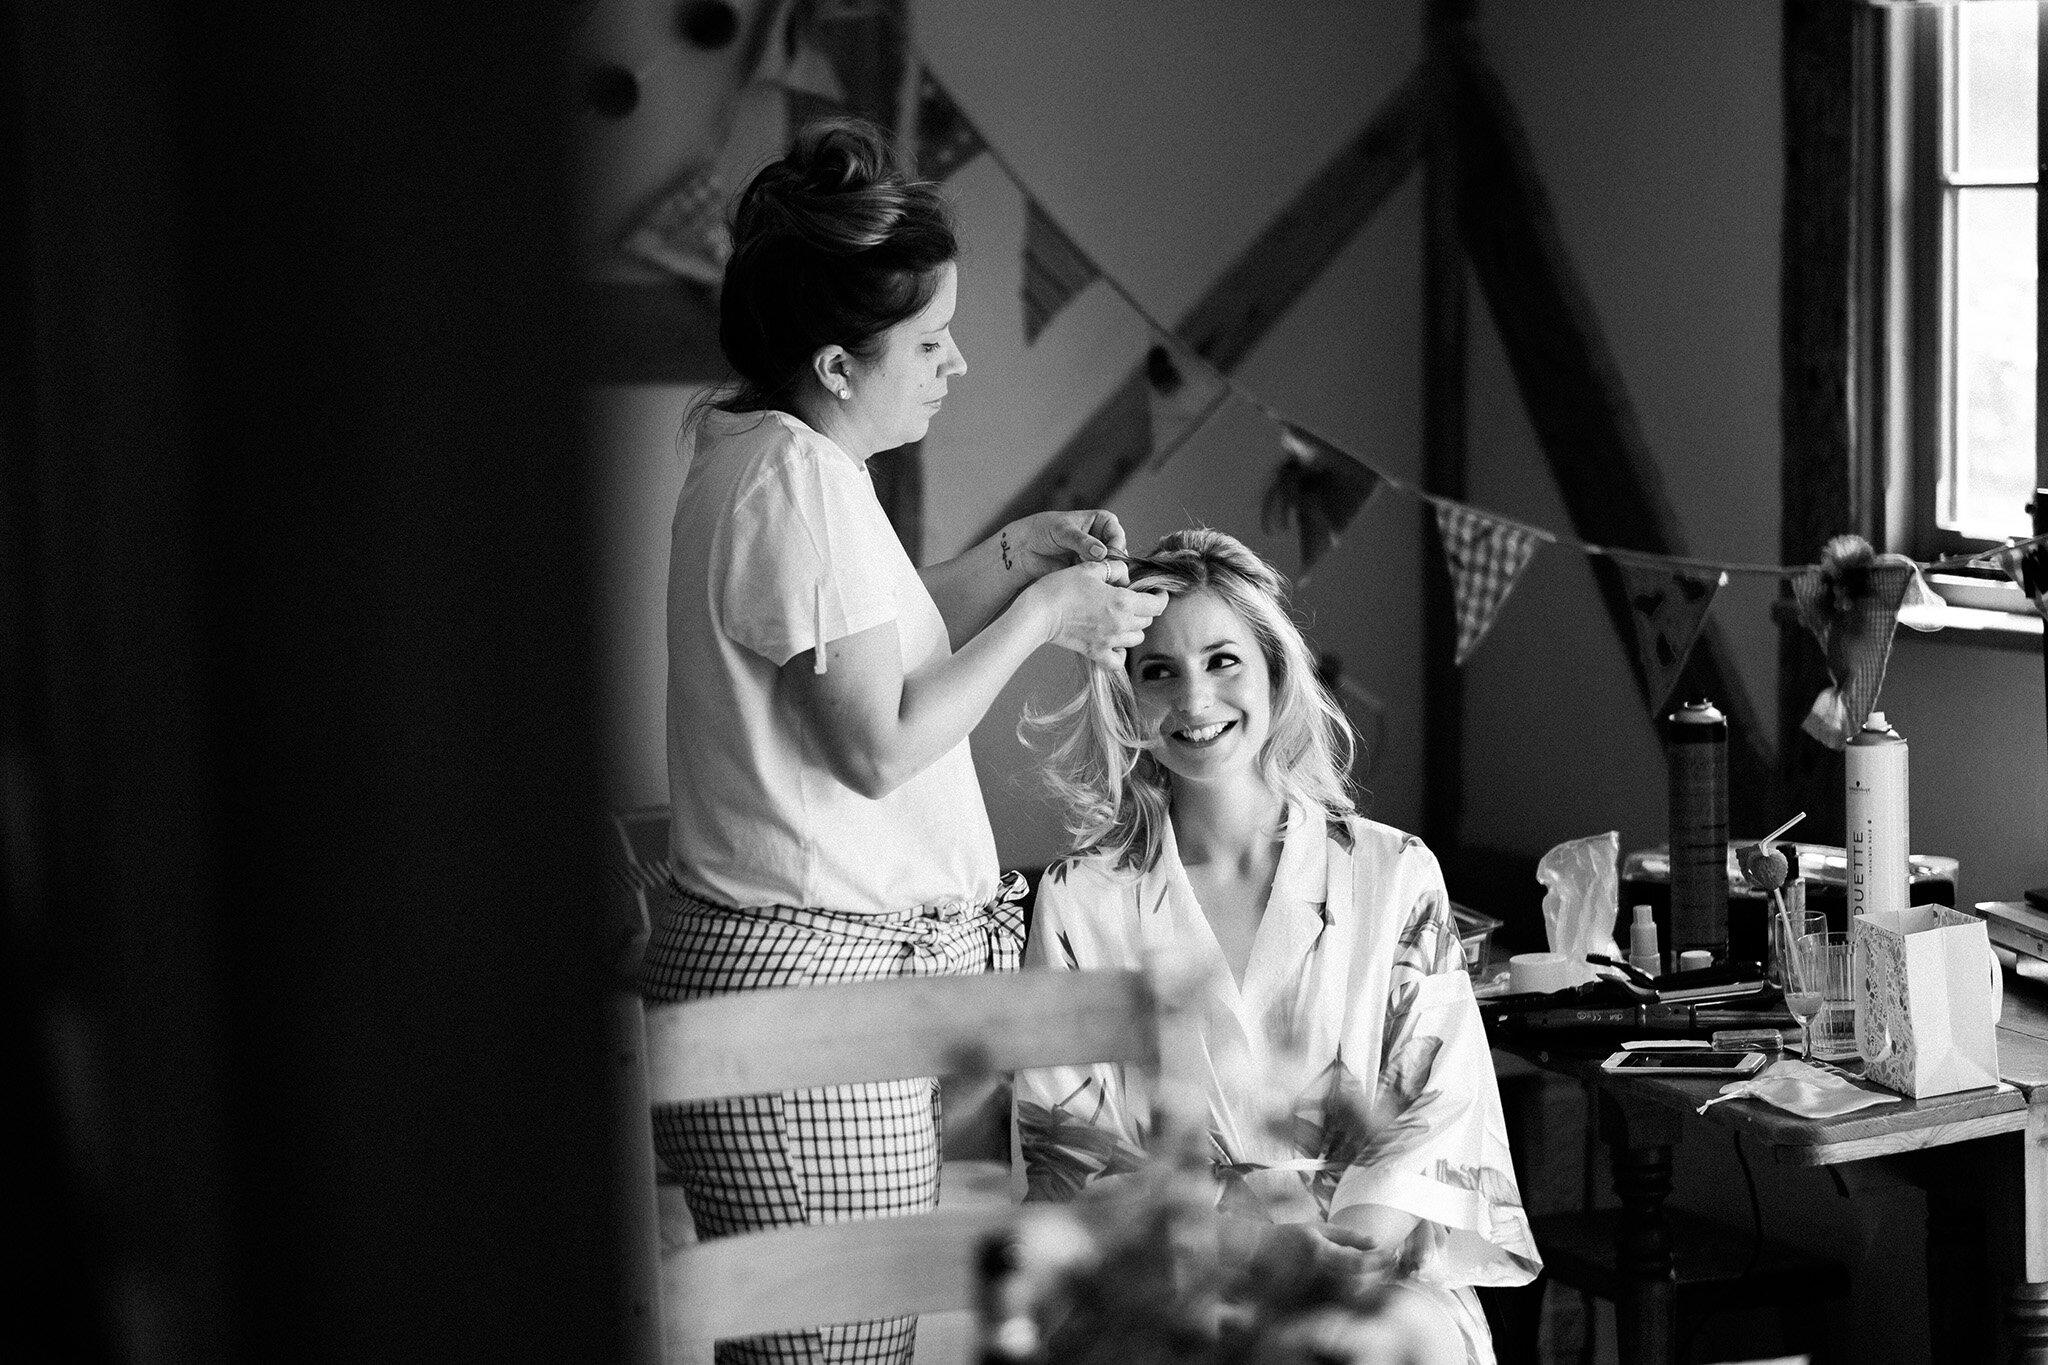 Scott-Stockwell-Photography-wedding-photographer-tim-alice-bride-prep.jpg